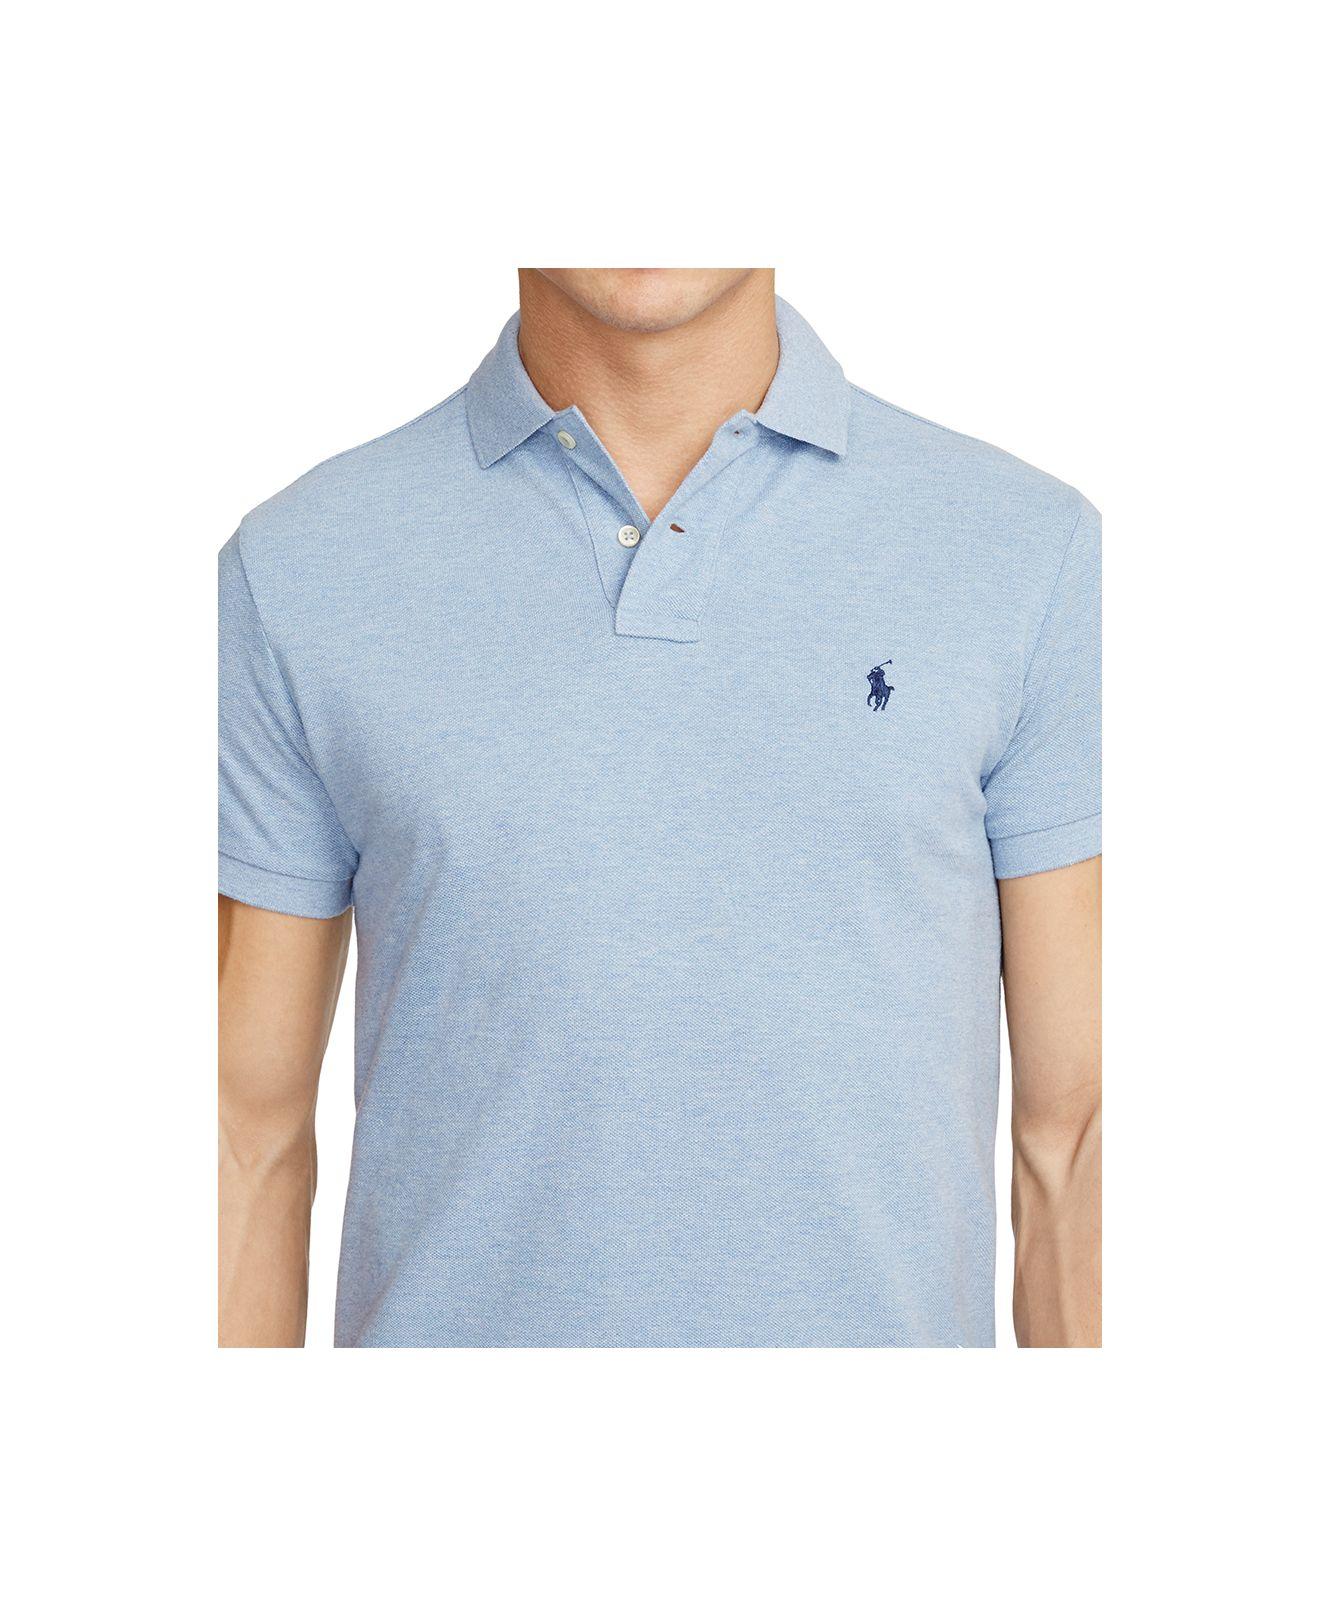 polo ralph lauren men 39 s slim fit mesh polo shirt in blue